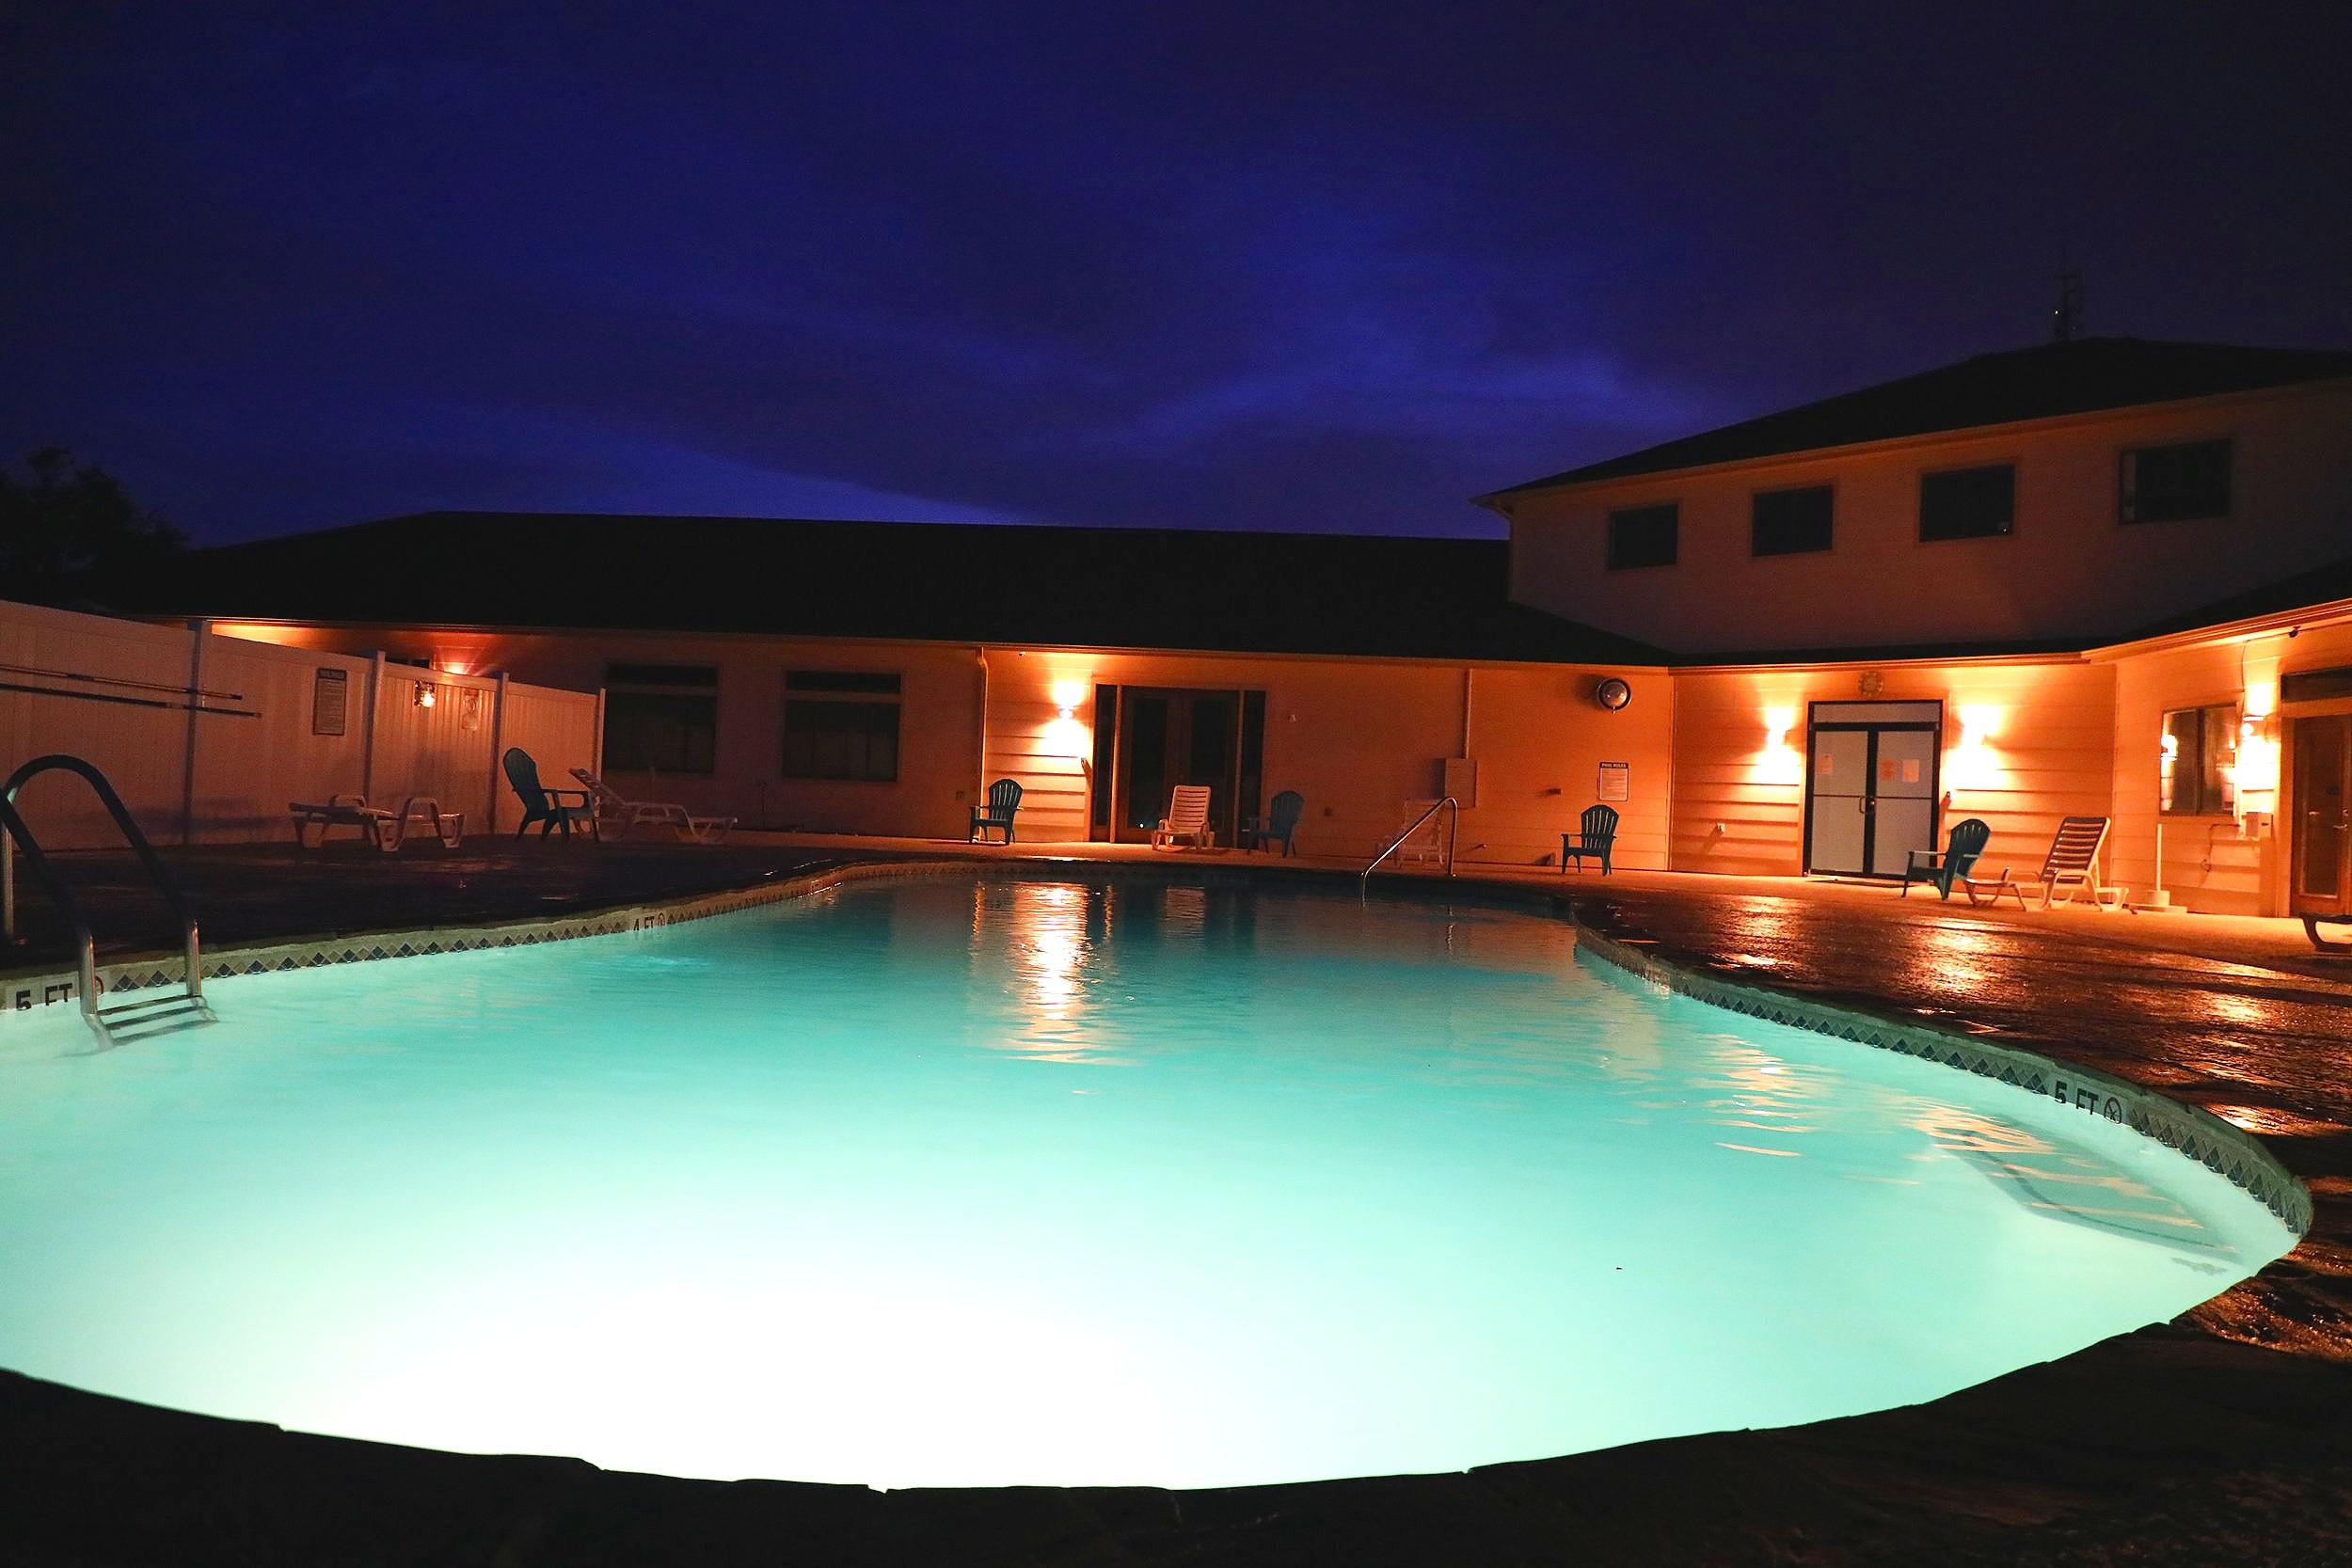 night+time+pool+234A1341.jpg